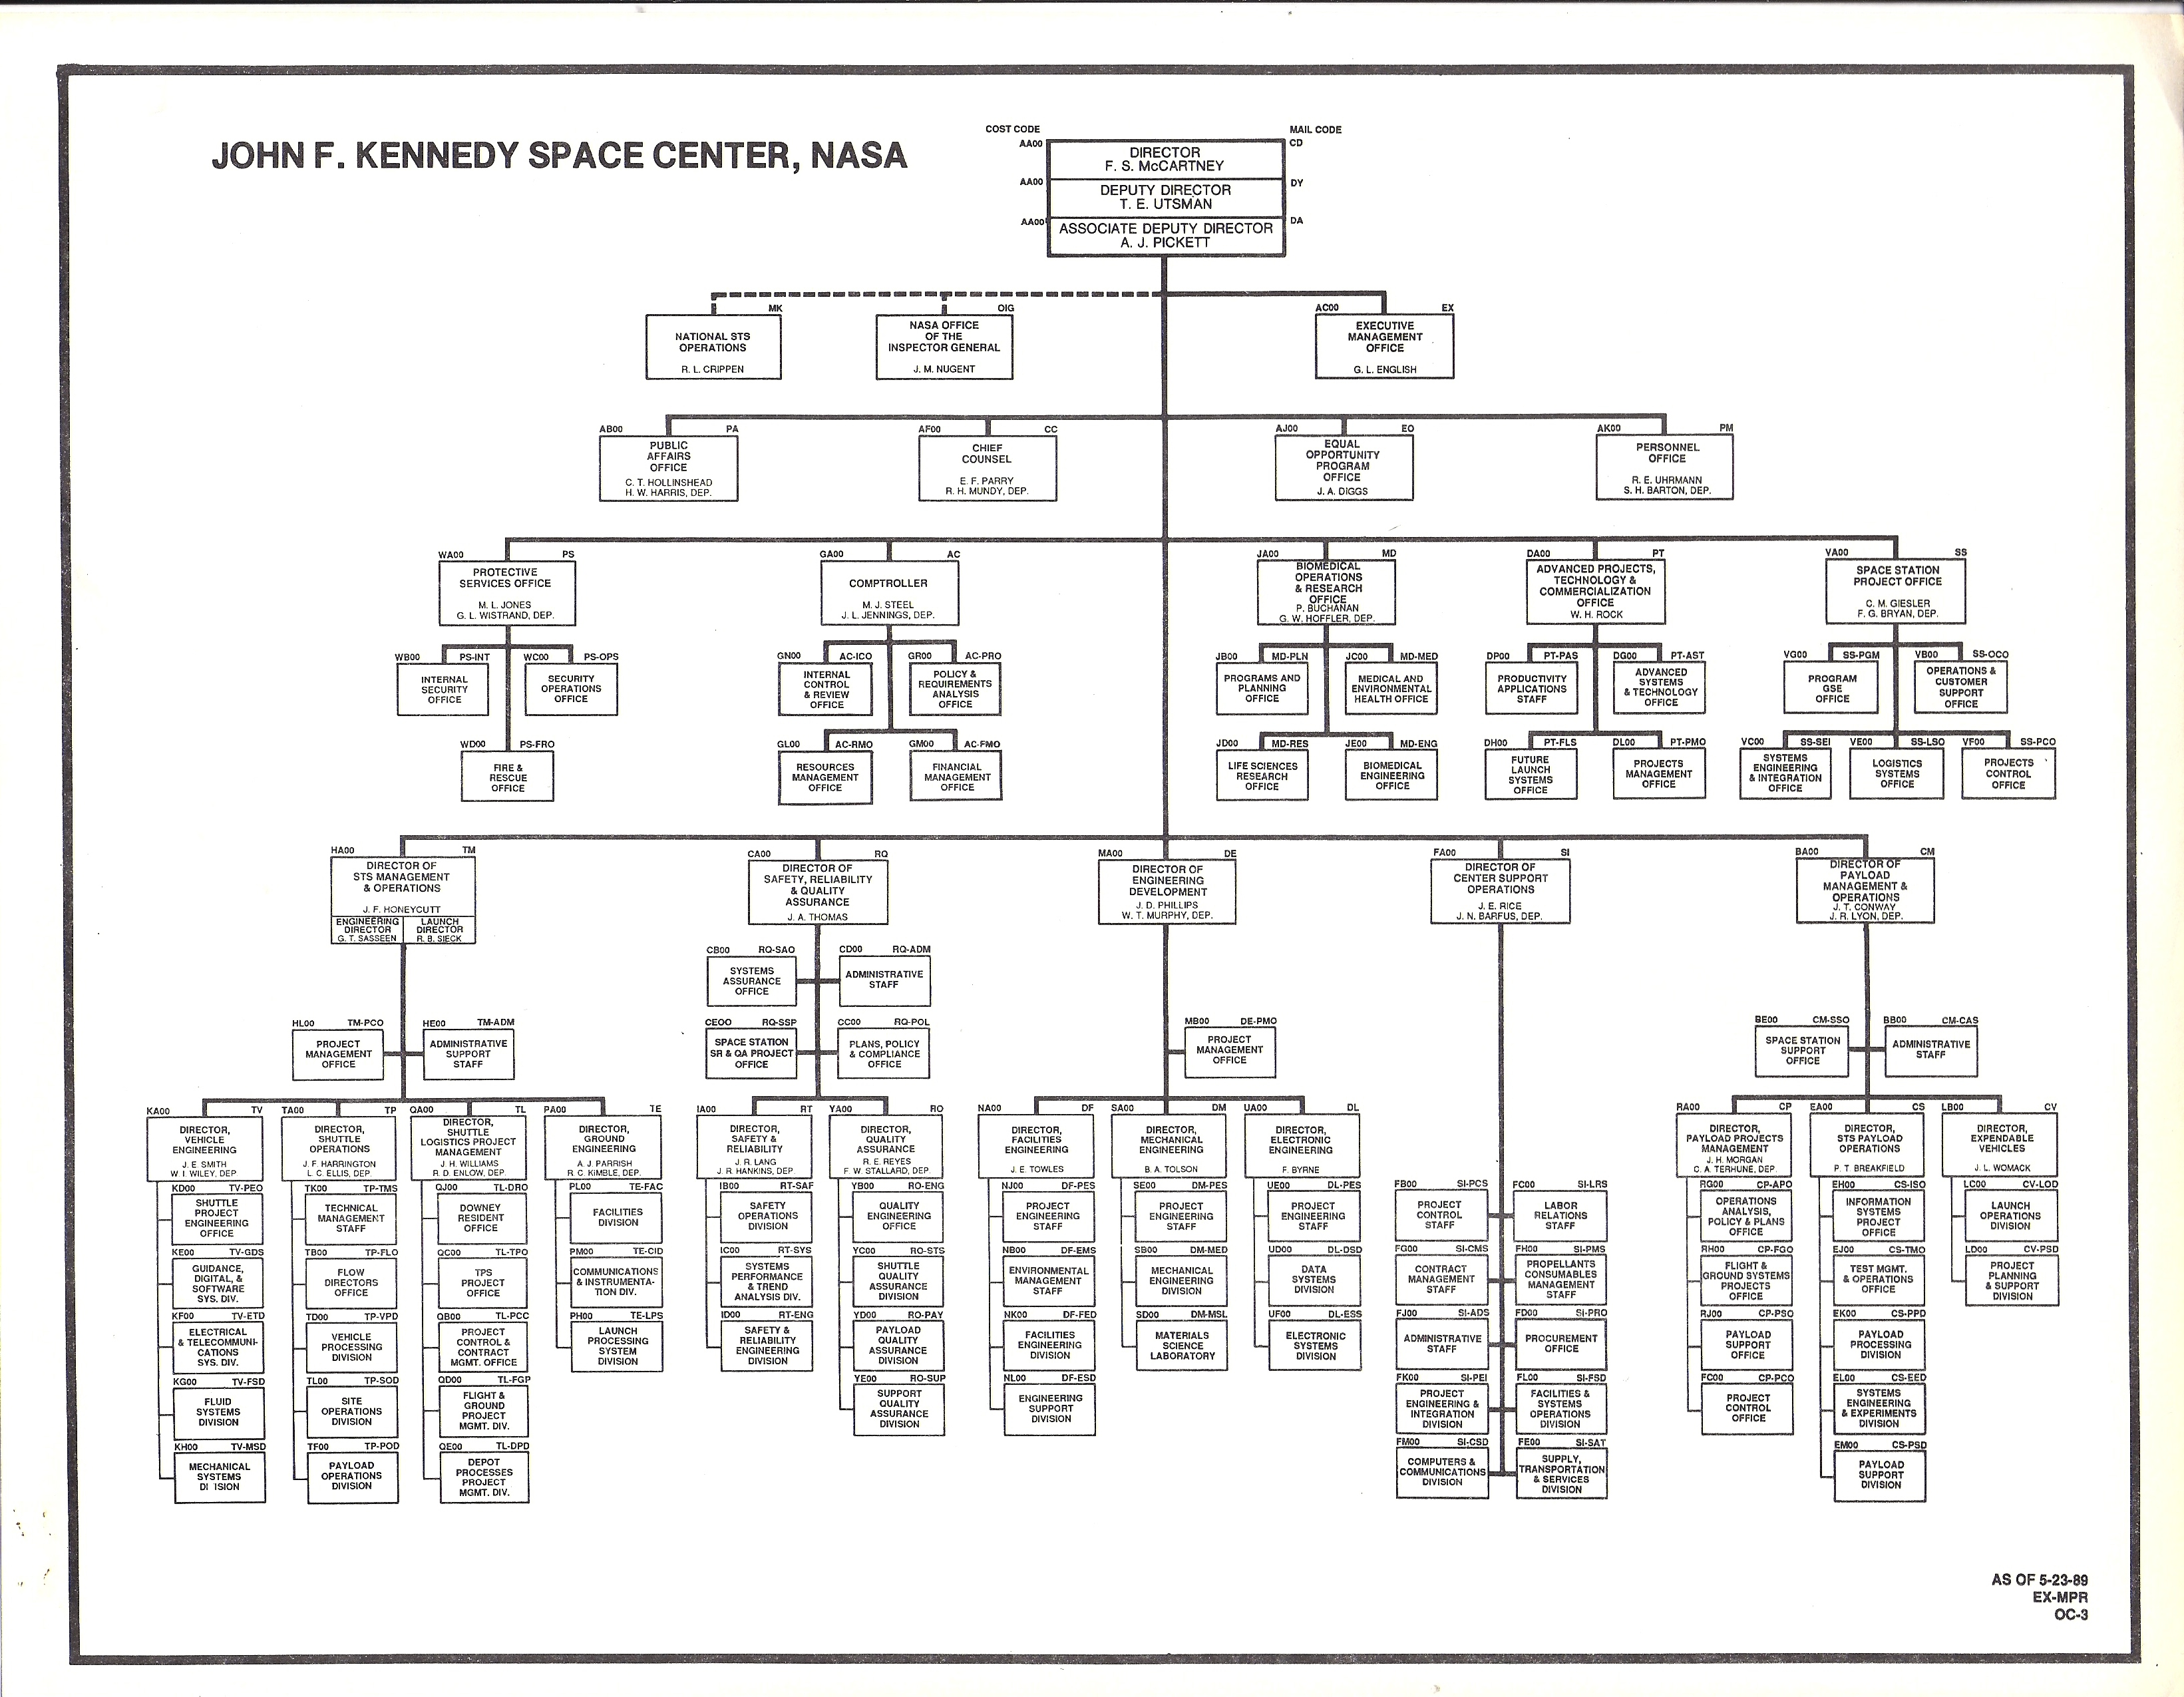 KSC Organization Charts